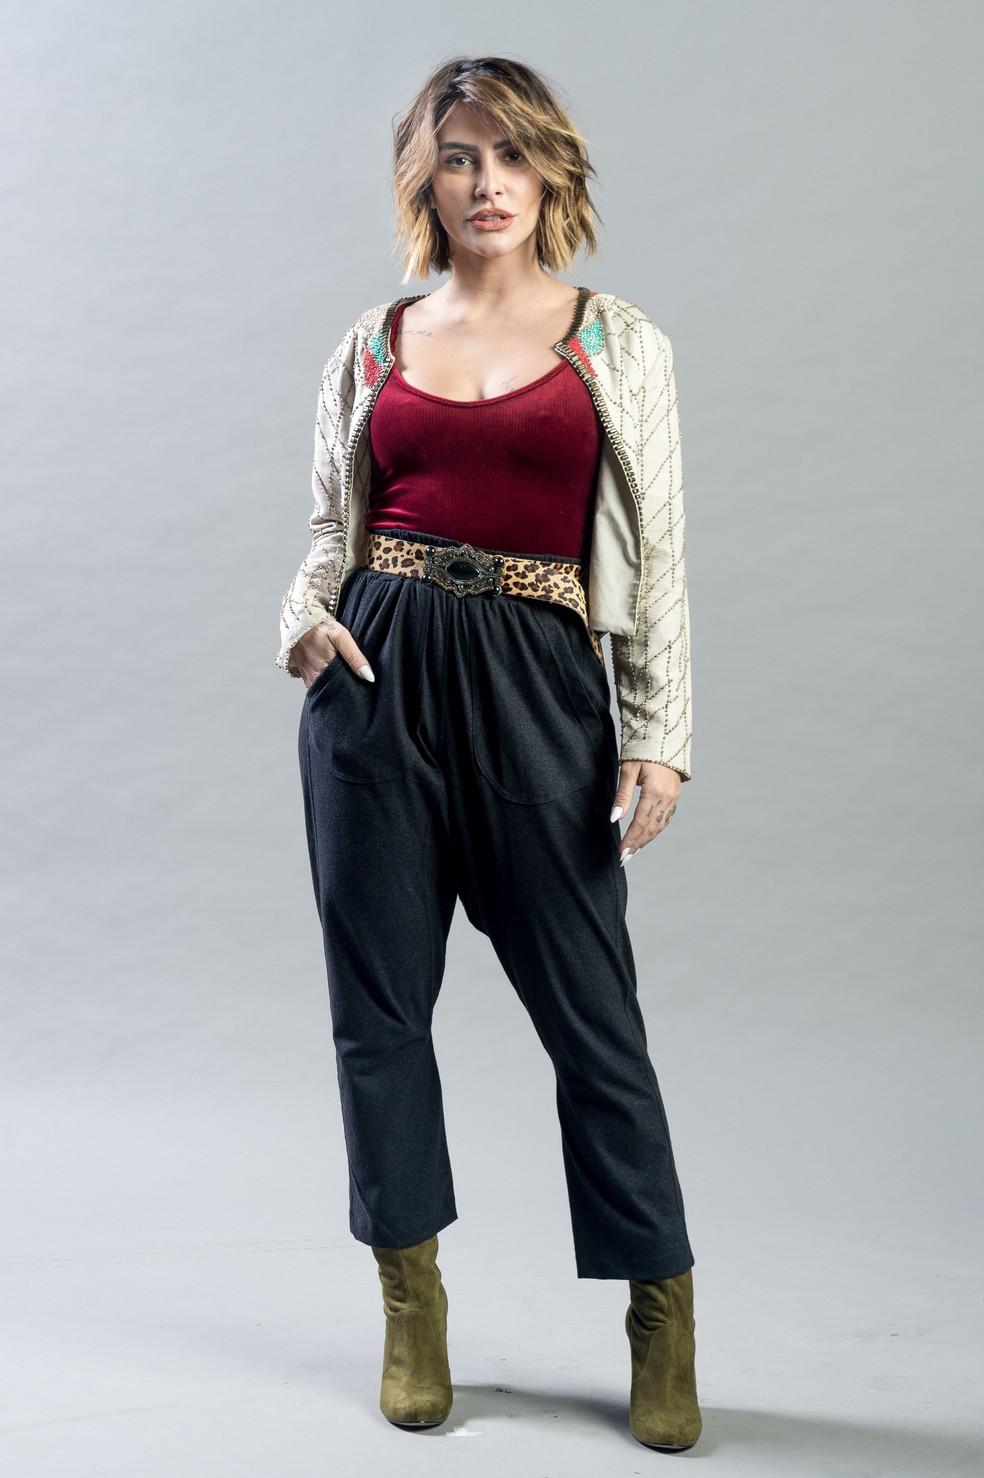 Inpire-se no visual de Betina para montar um look superatual  Foto Raquel CunhaTV Globo